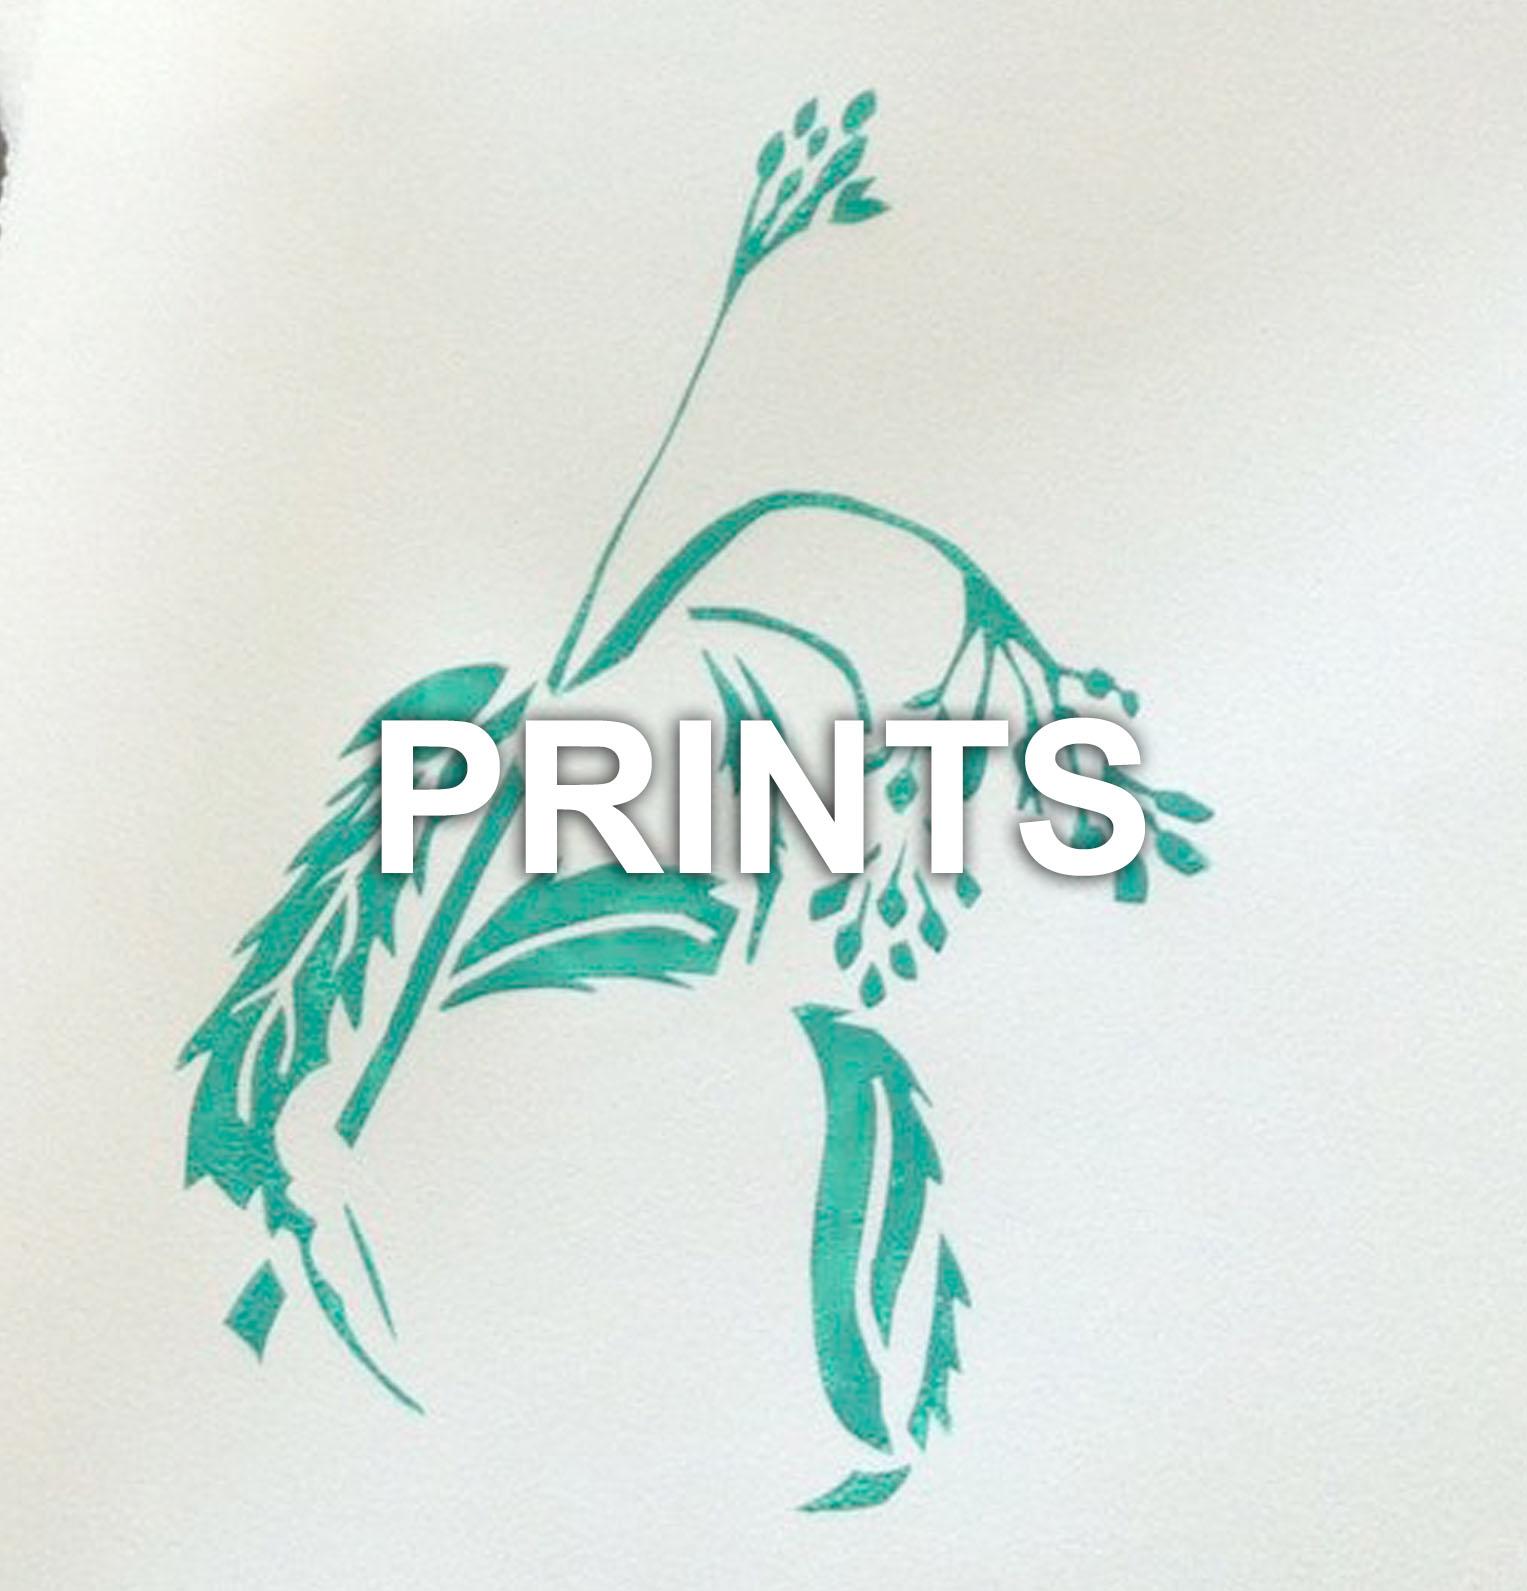 Prints_thumbnail.jpg